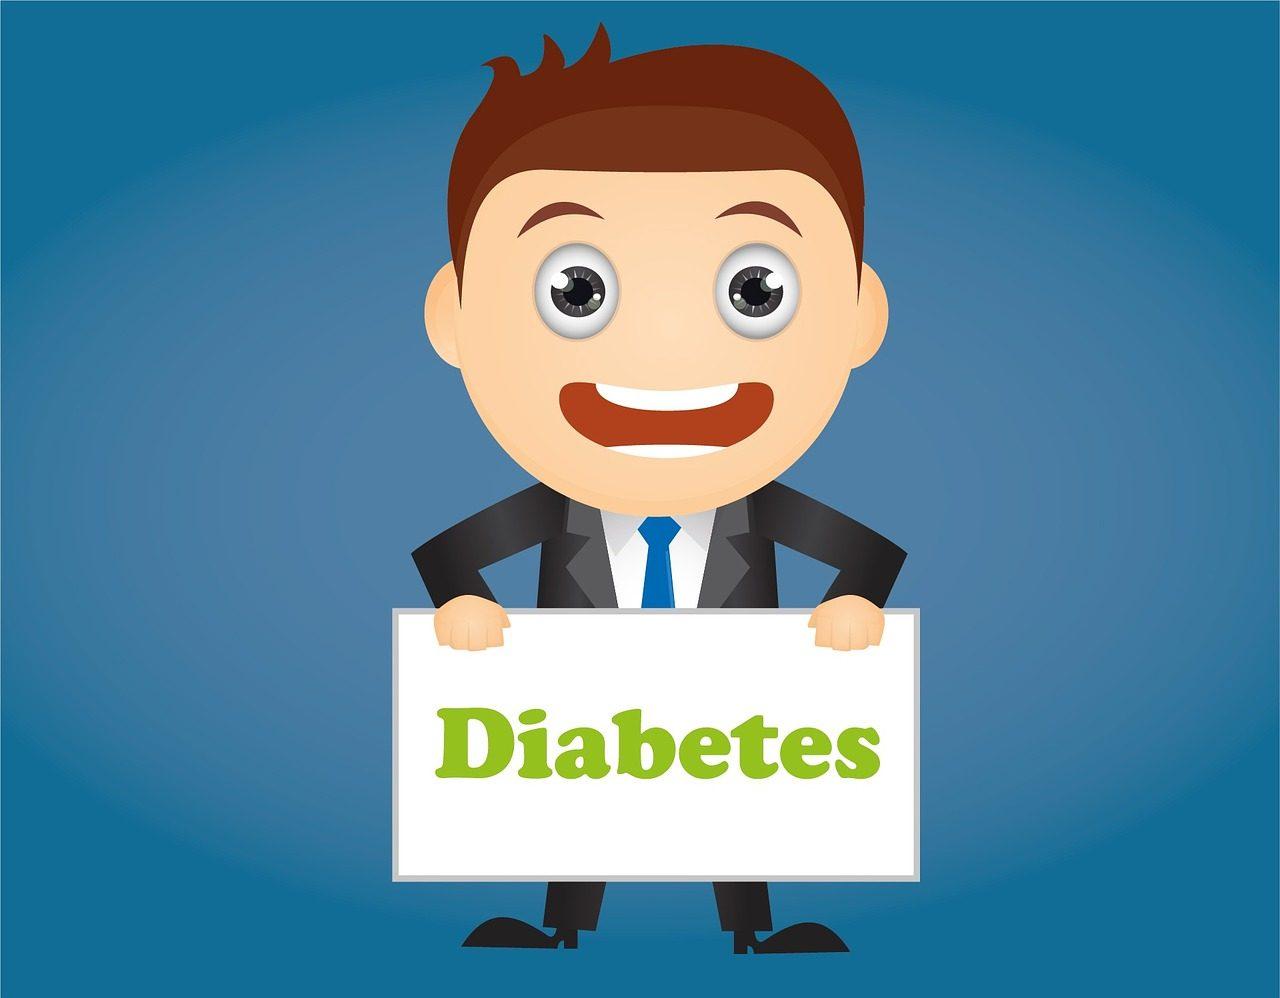 diabetes-1270346_1280-1-1280x998.jpg